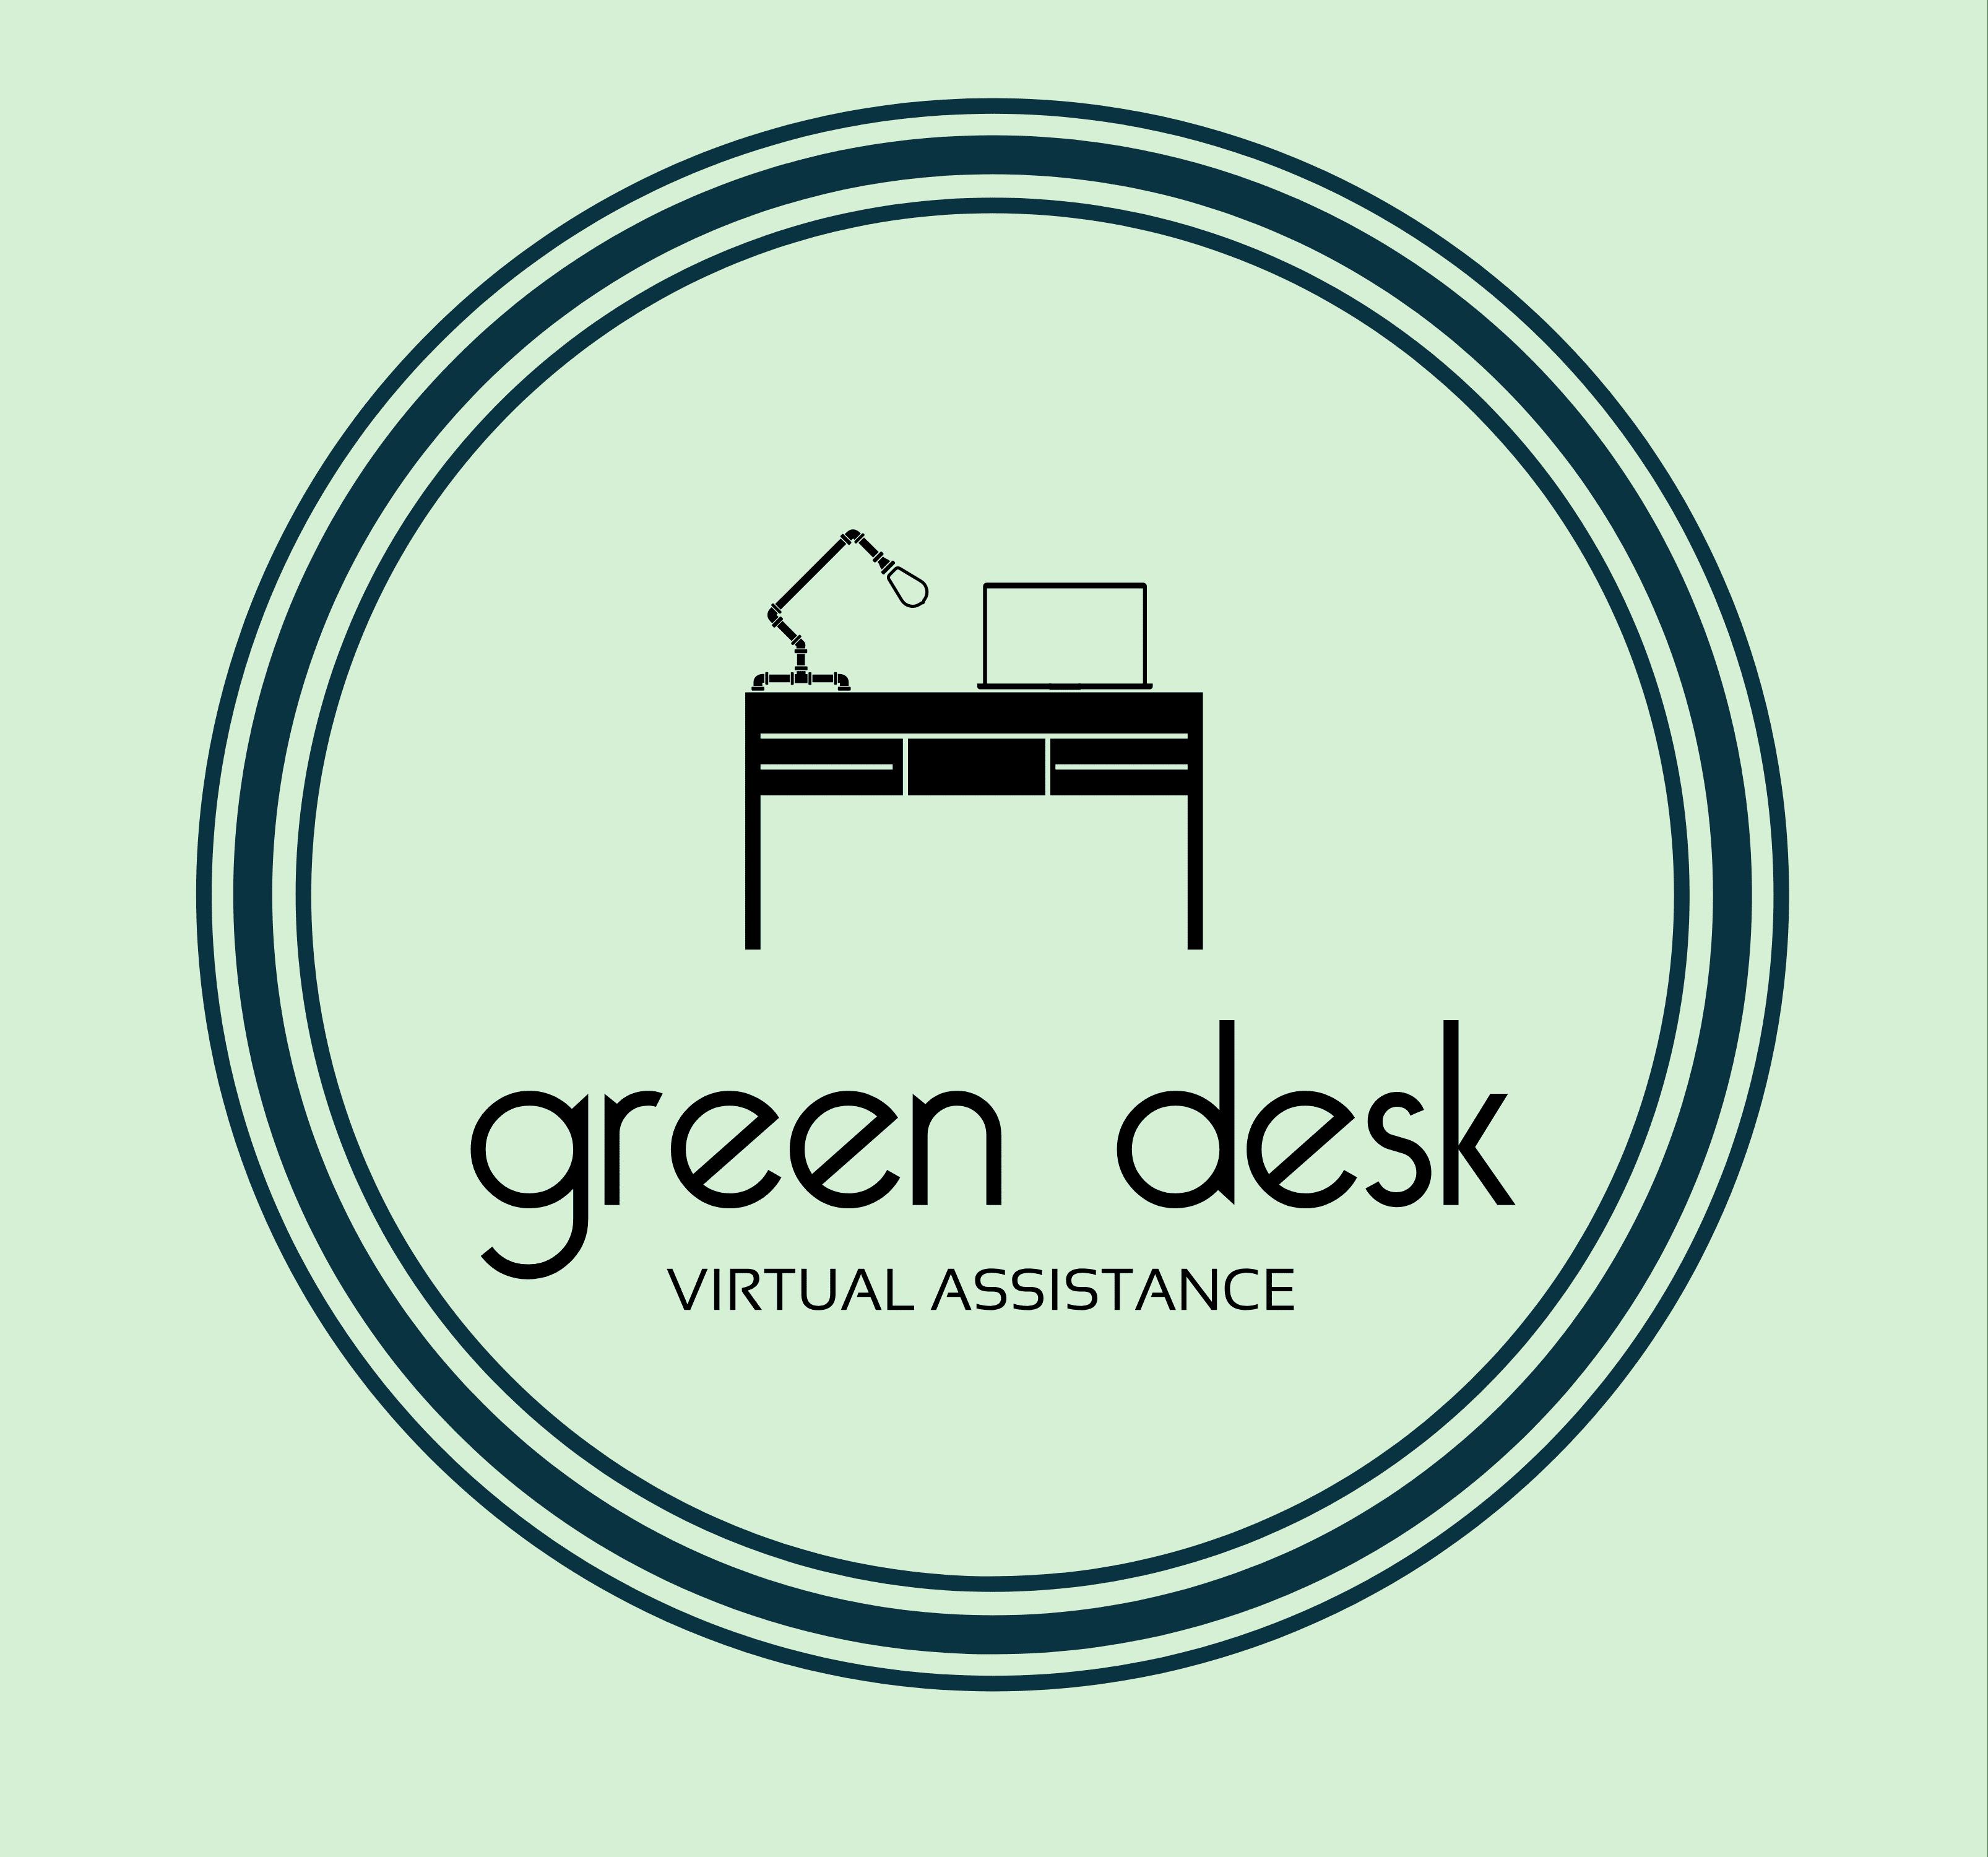 Green Desk Virtual Assistance